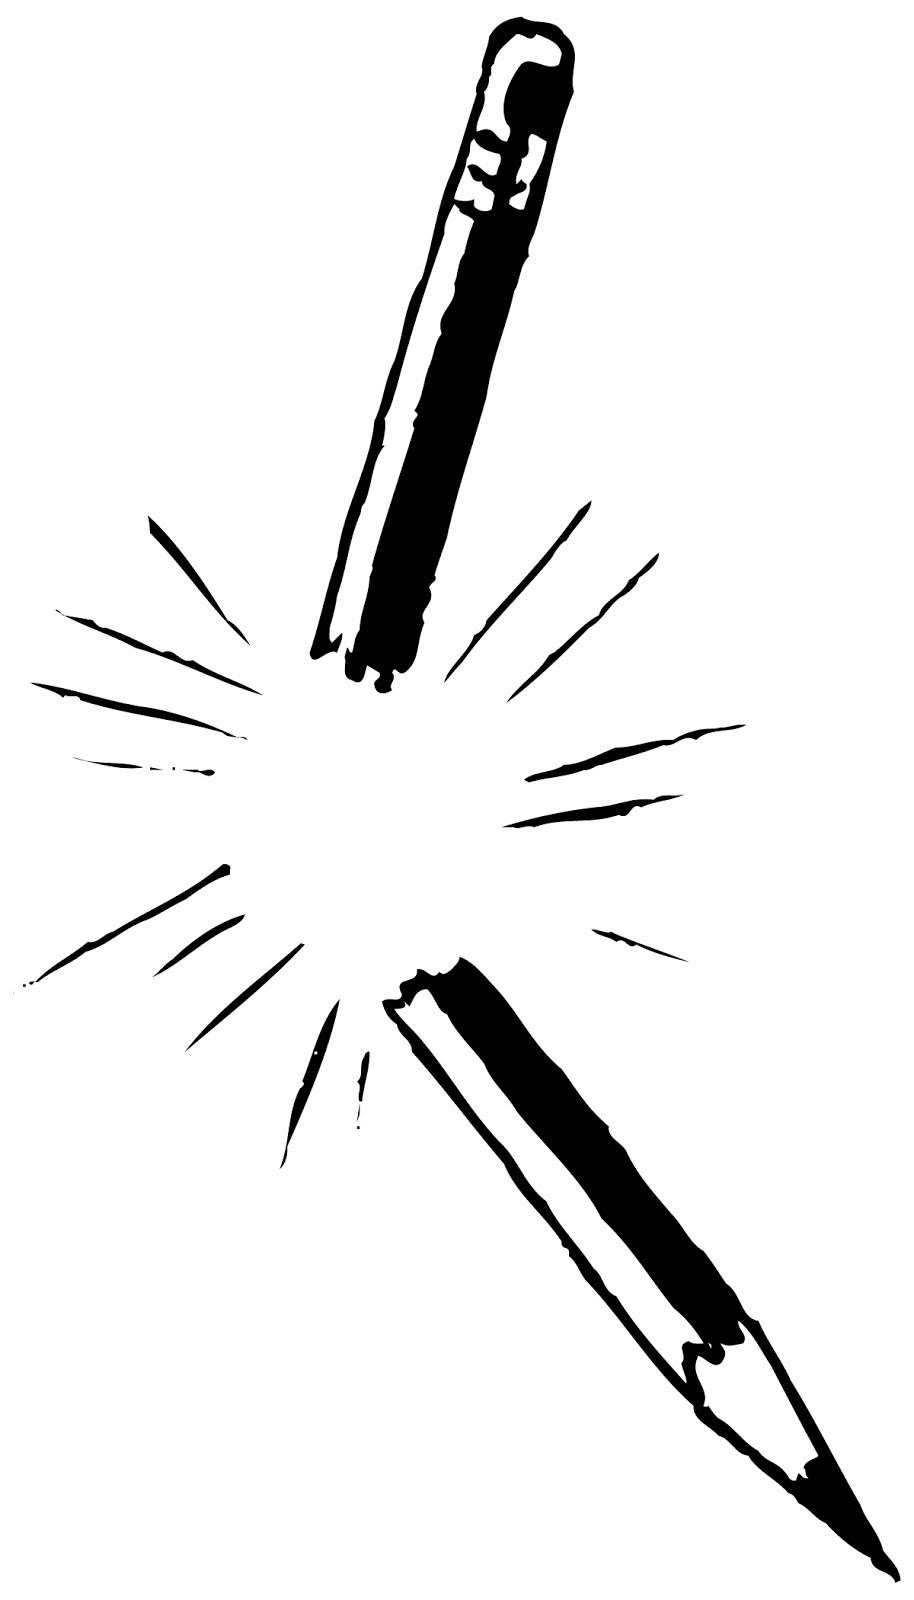 Broken Pencil Point Clipart.